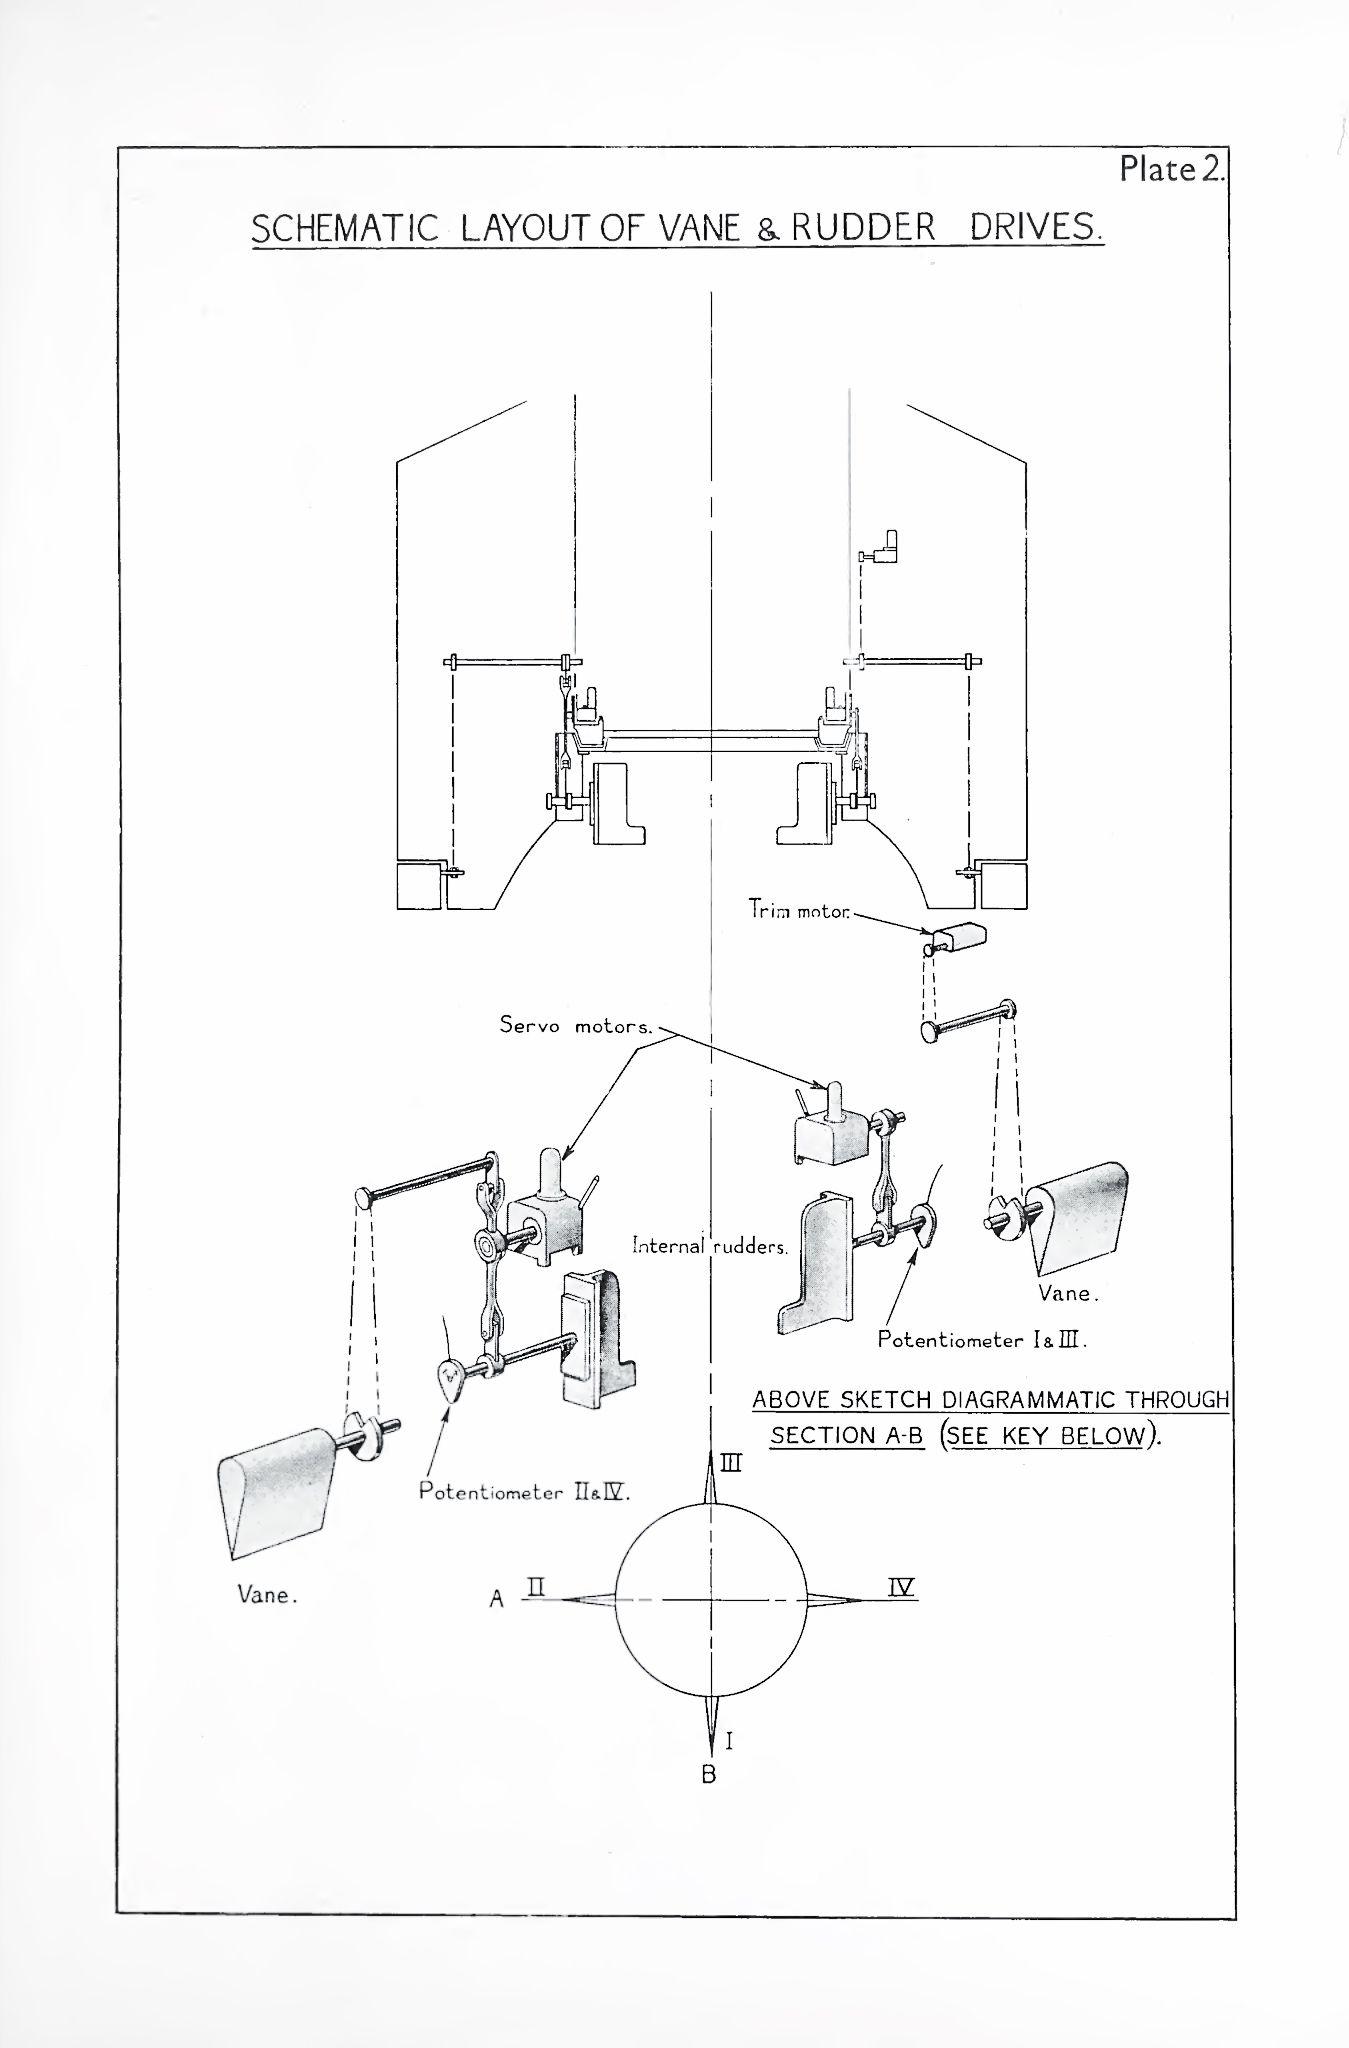 Rudders and jetvanes of the A4/V2 rocket. | V-2/A-4 rocket (German